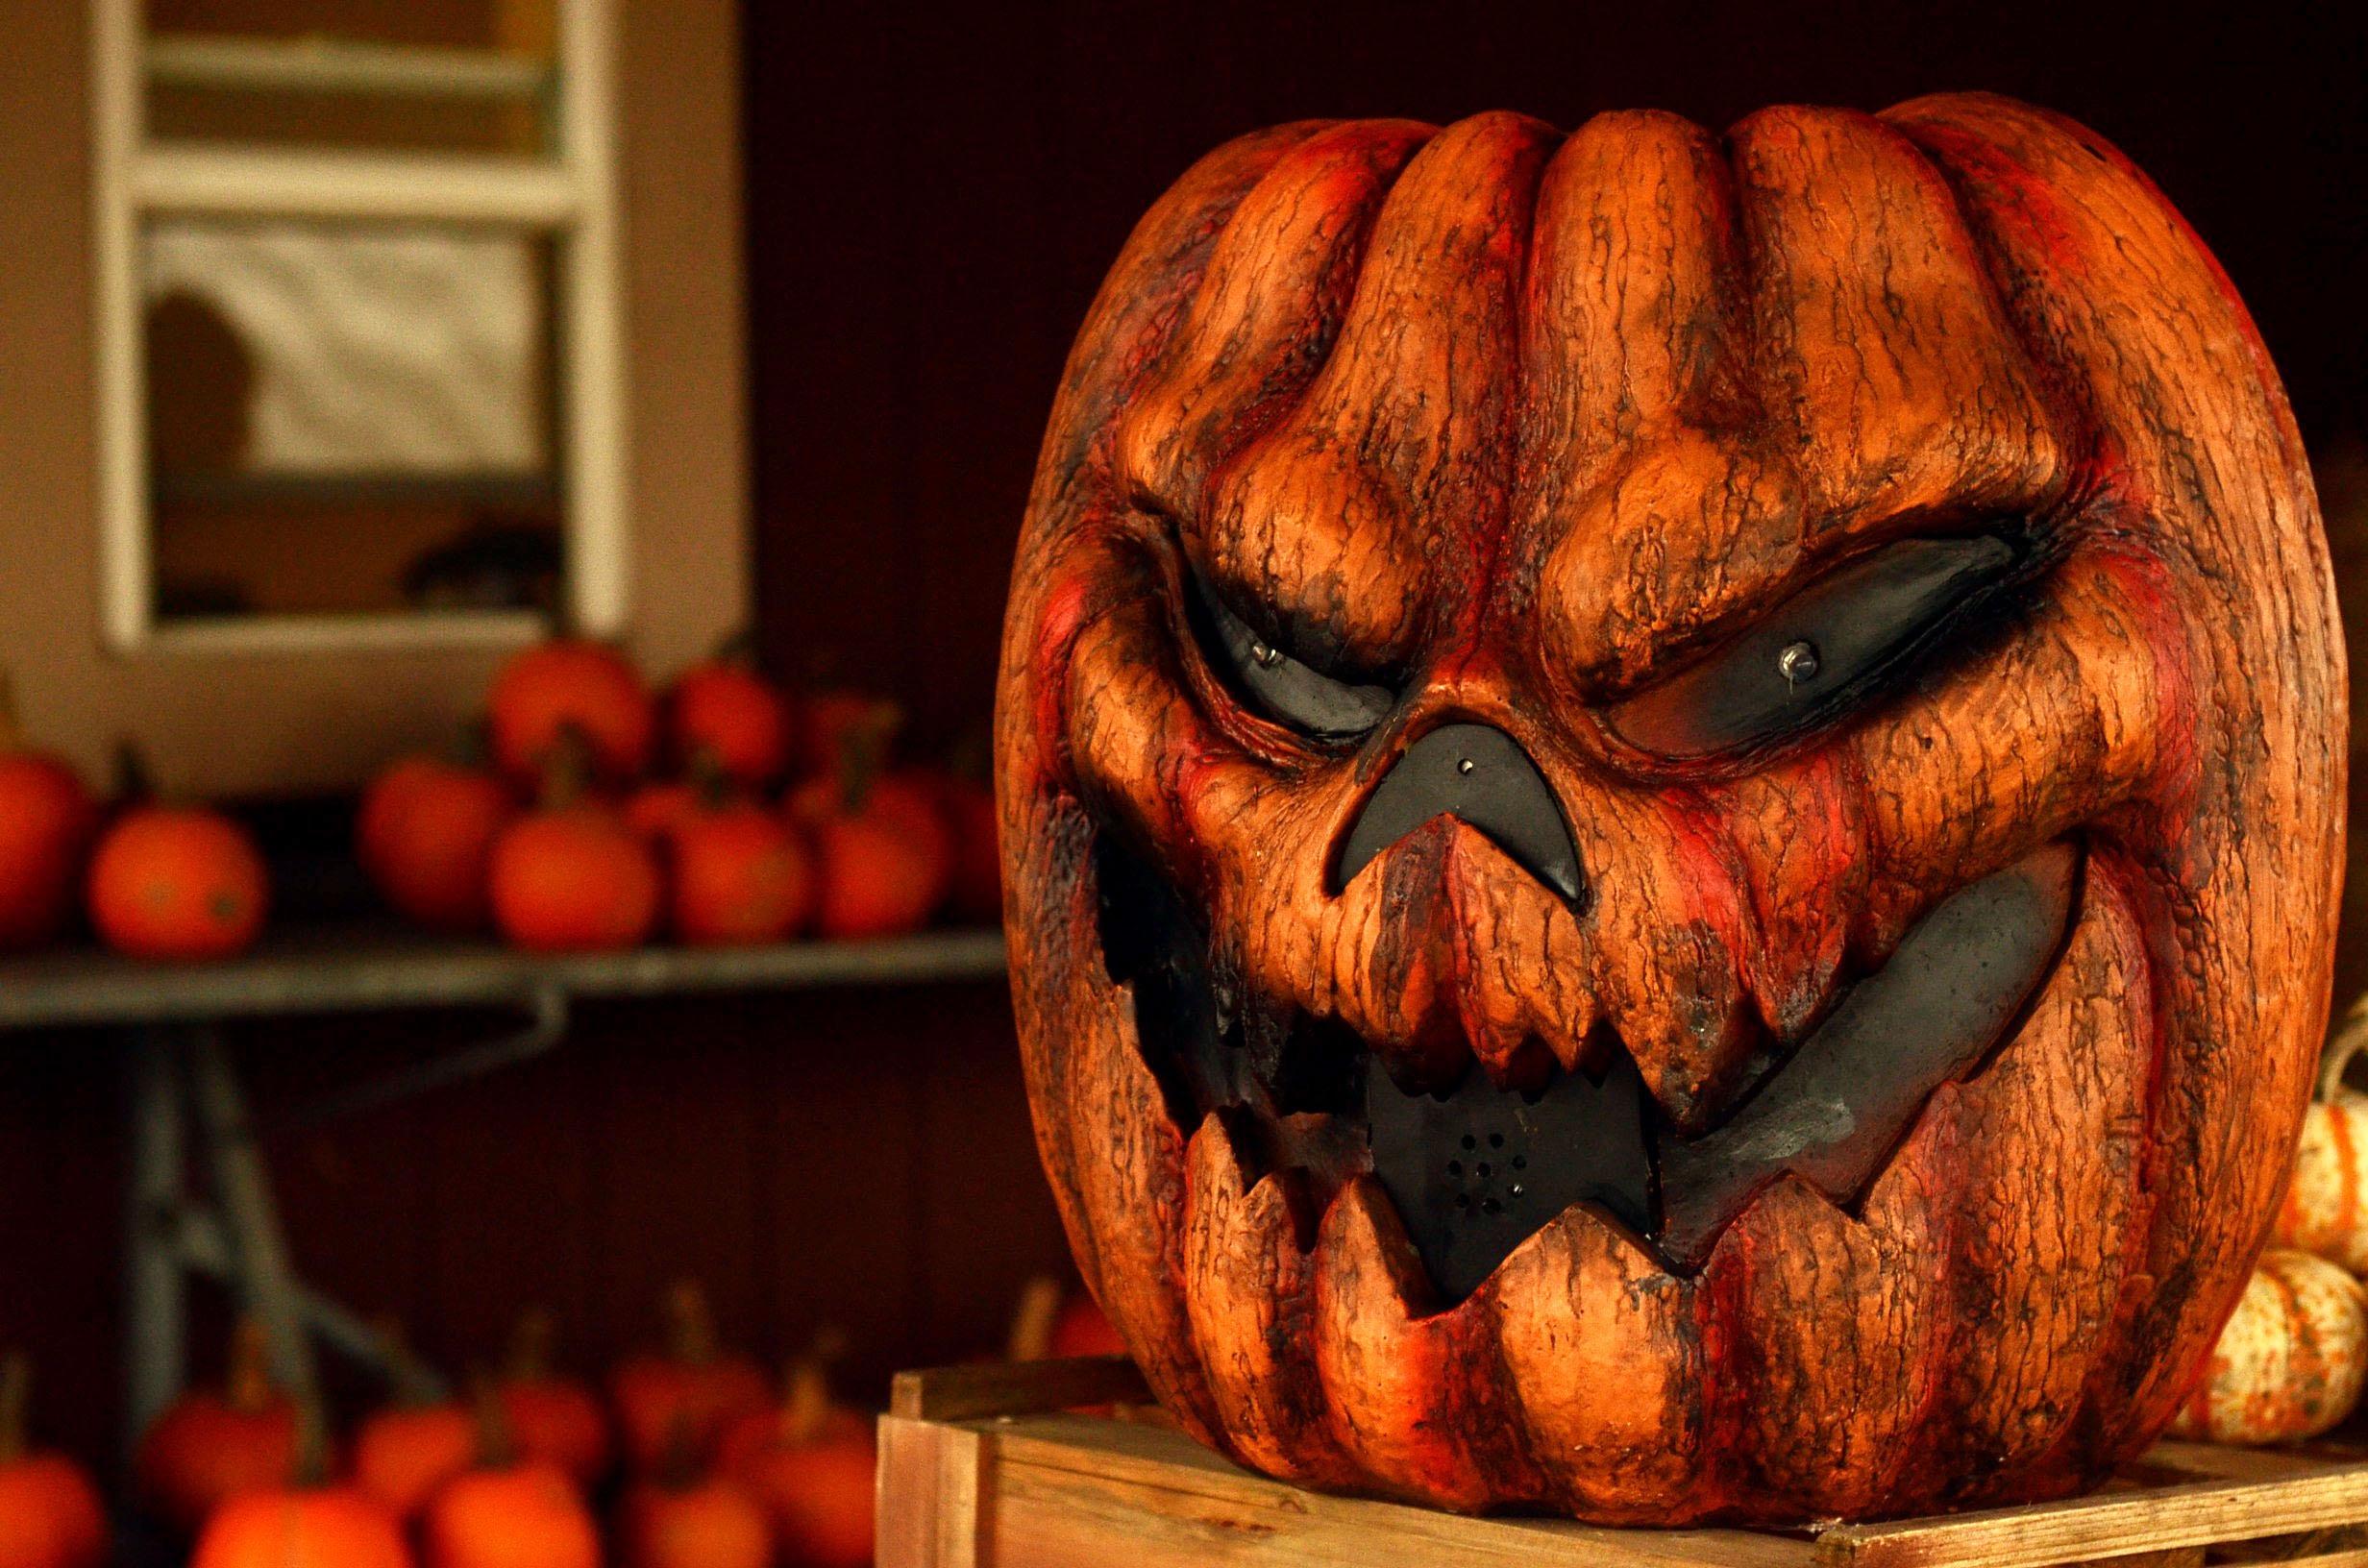 scary stoner Halloween stories